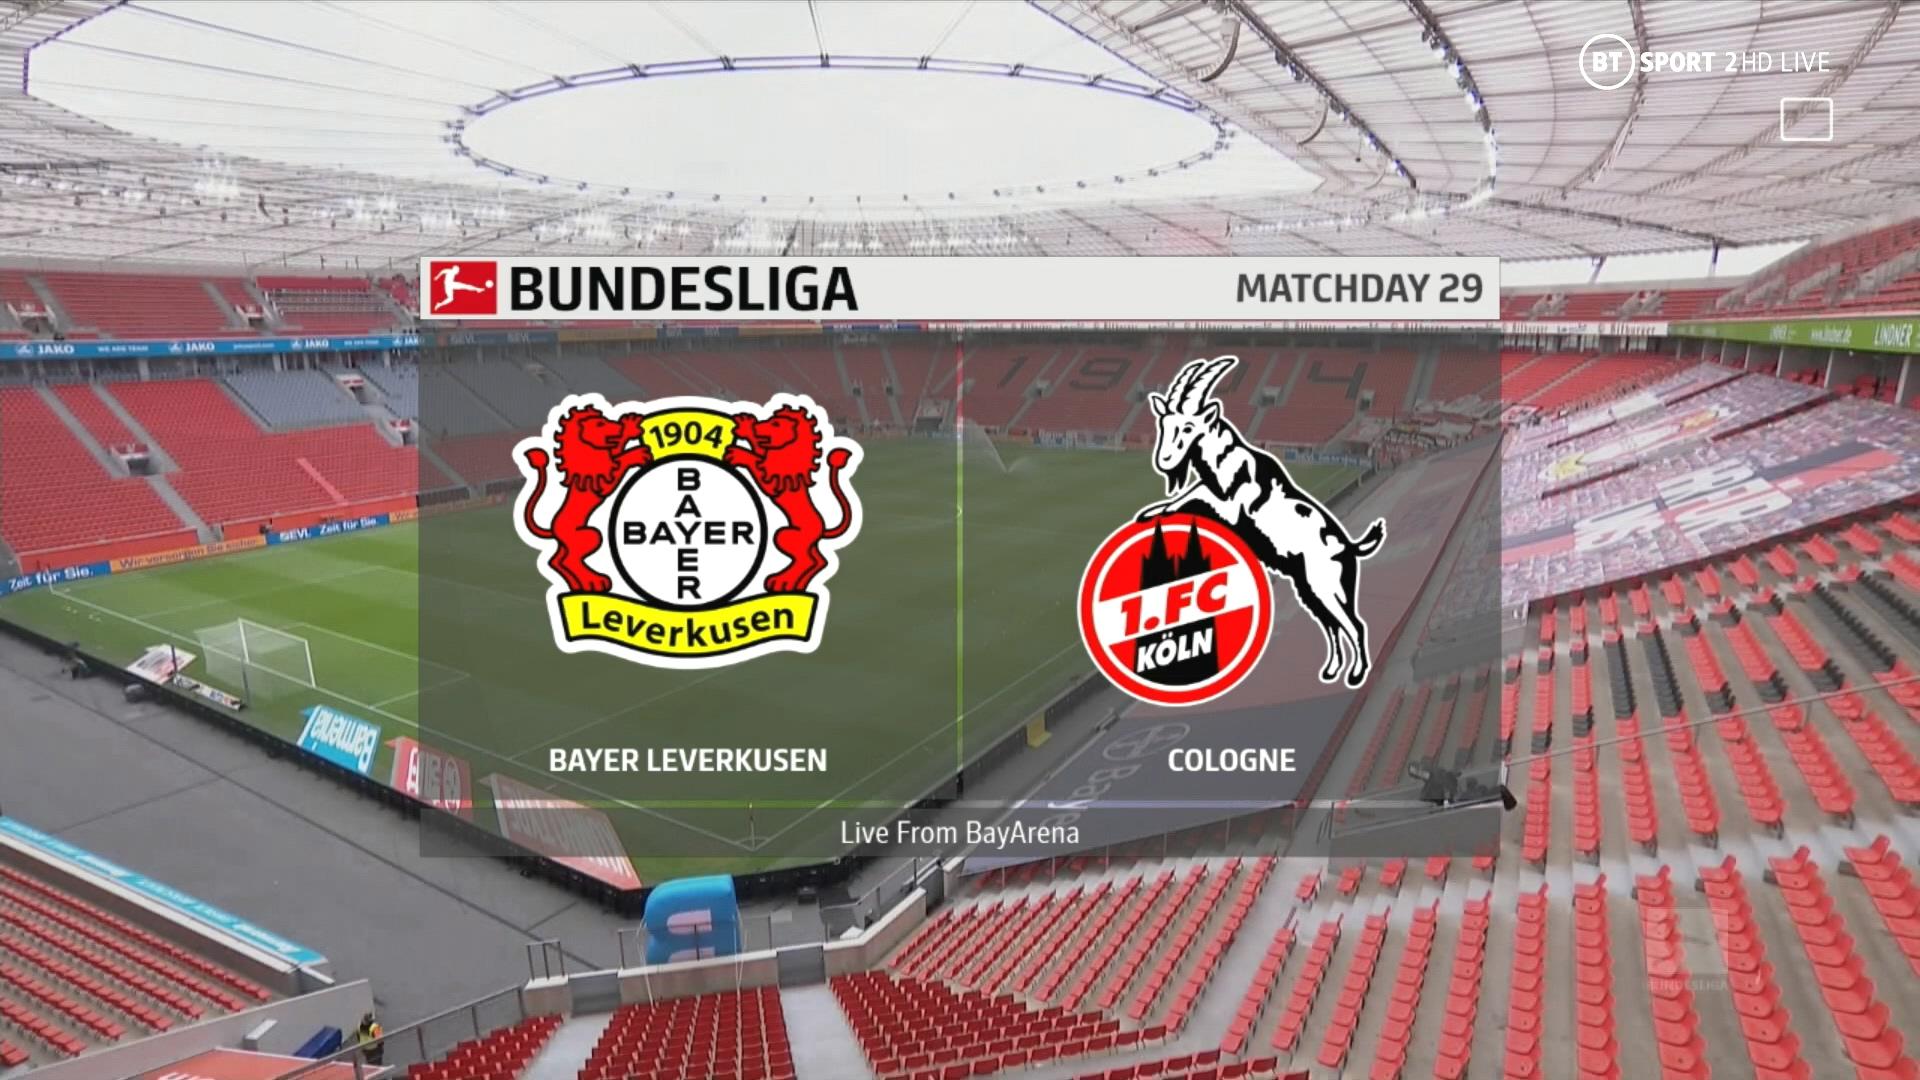 Bundesliga 20/21 J29 - Bayer Leverkusen vs Köln - 17/04/2021